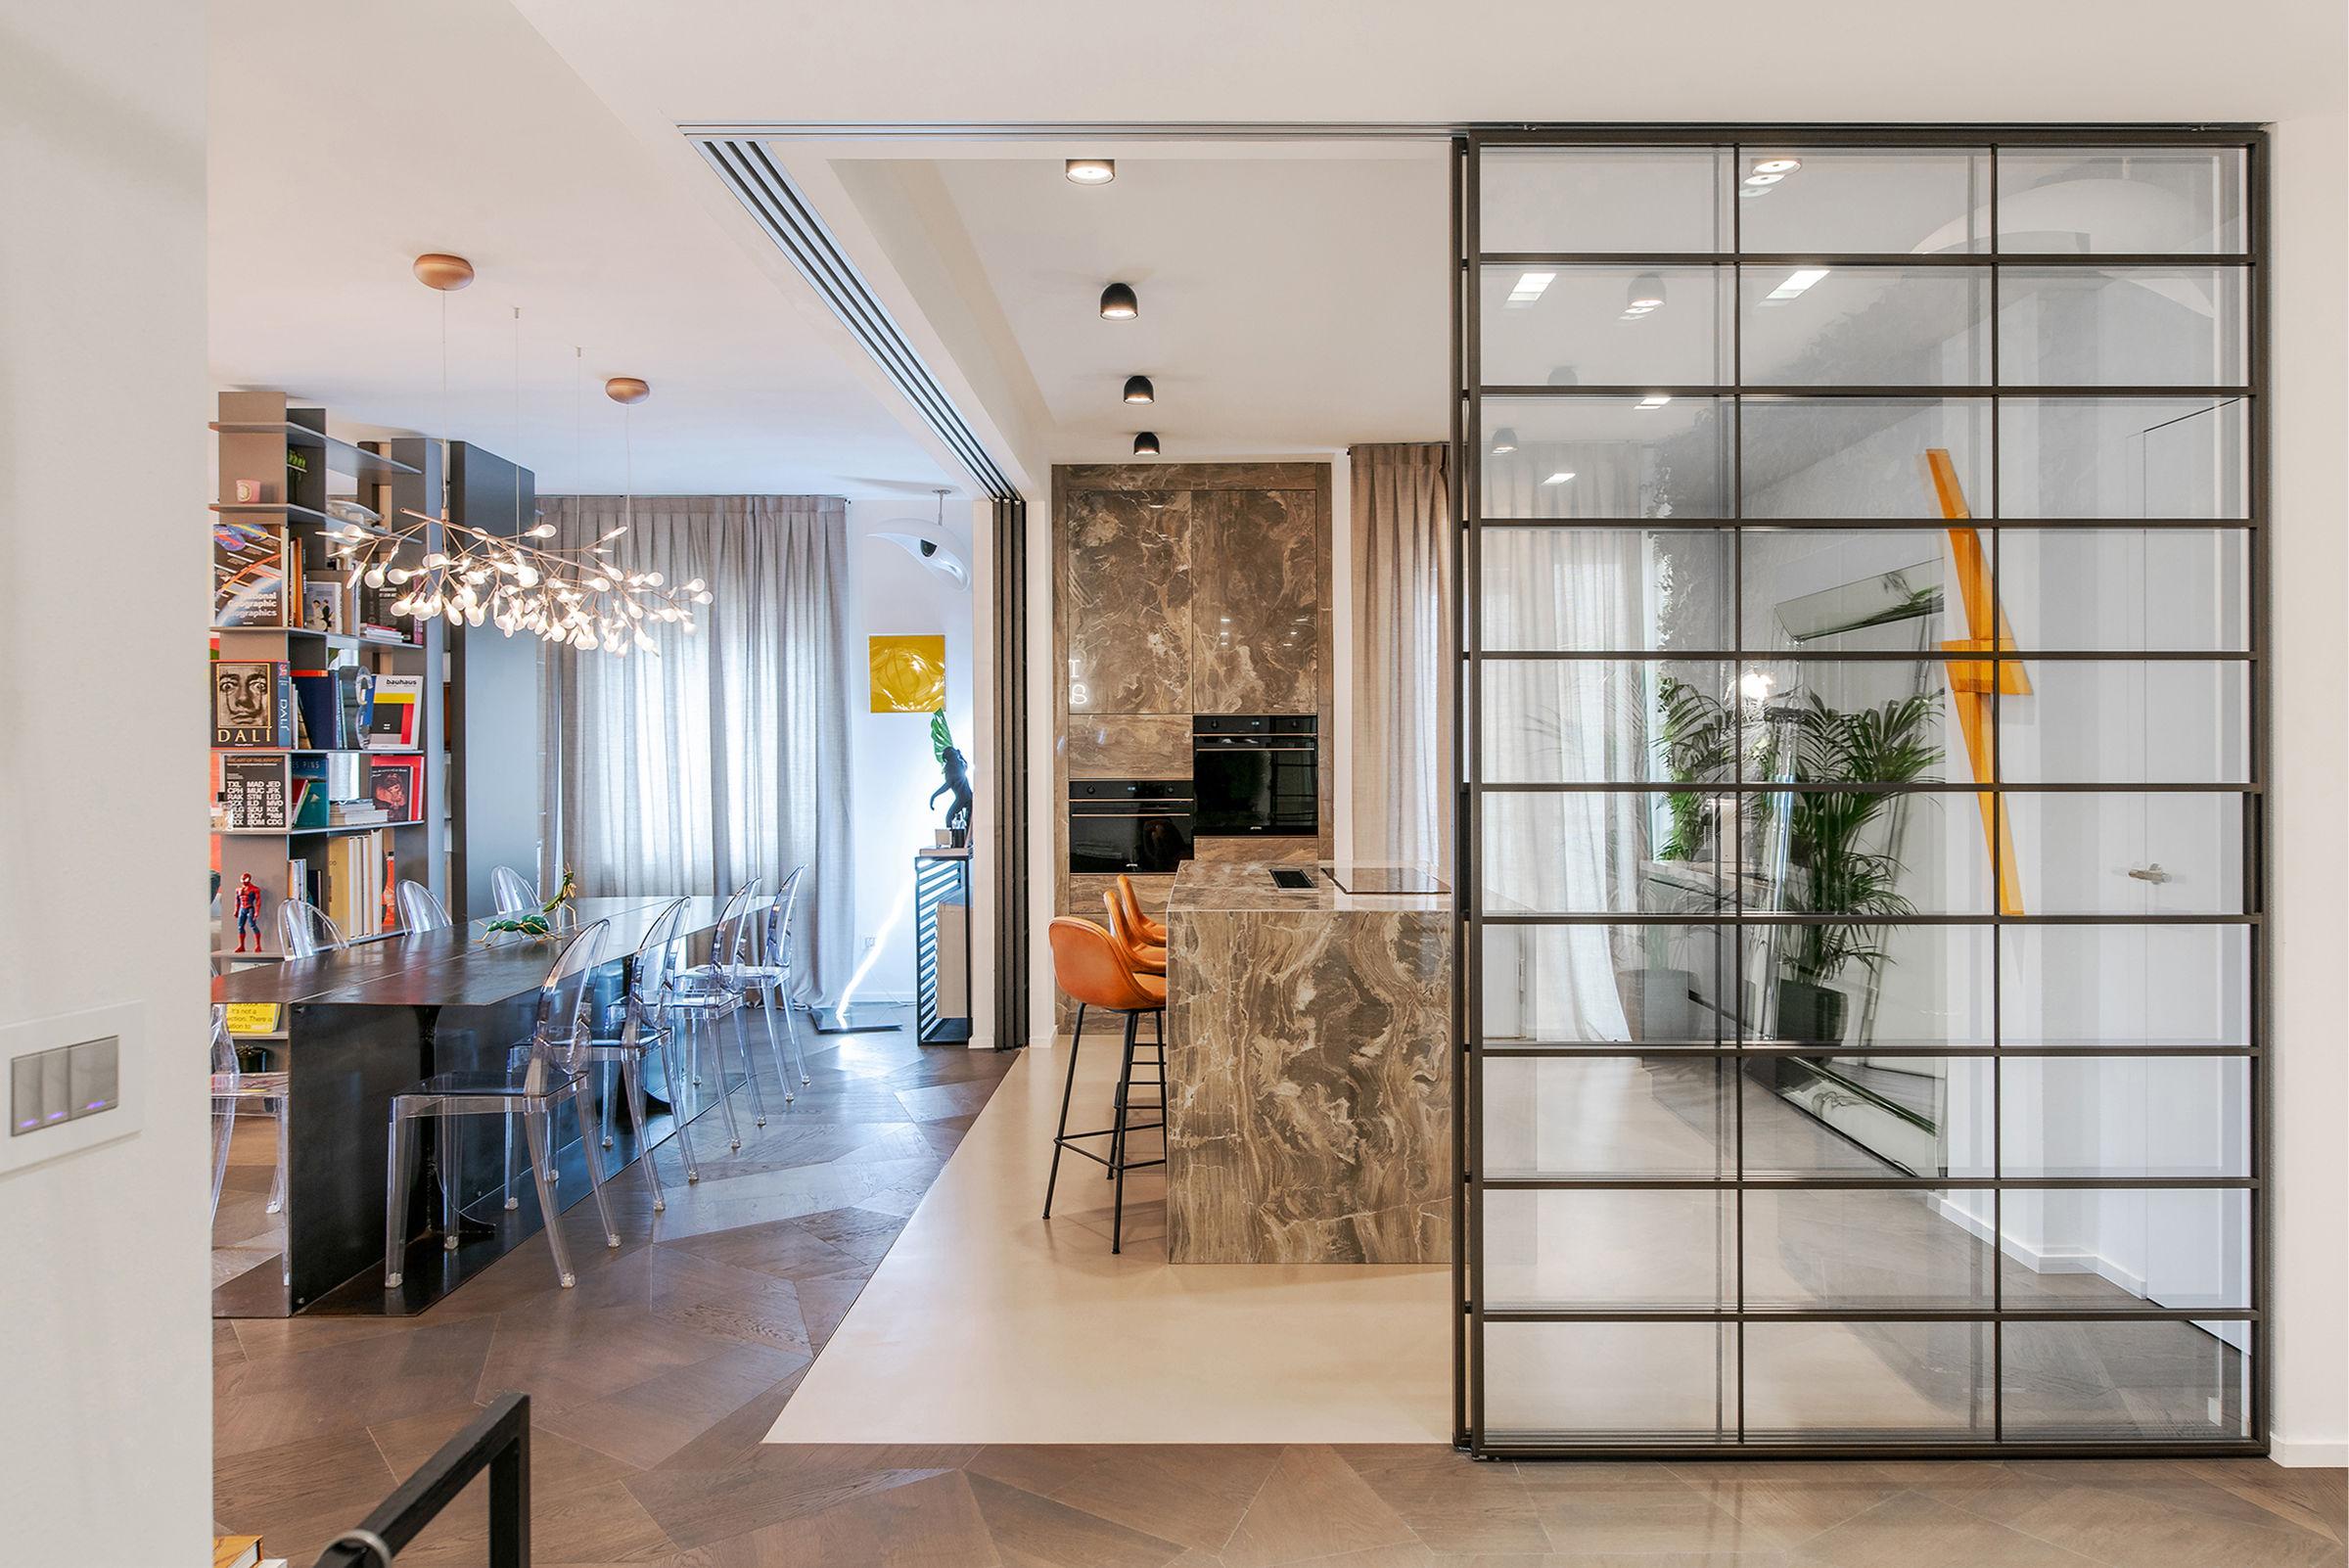 Architettura And Design pop house | modo architettura + design | media - photos and